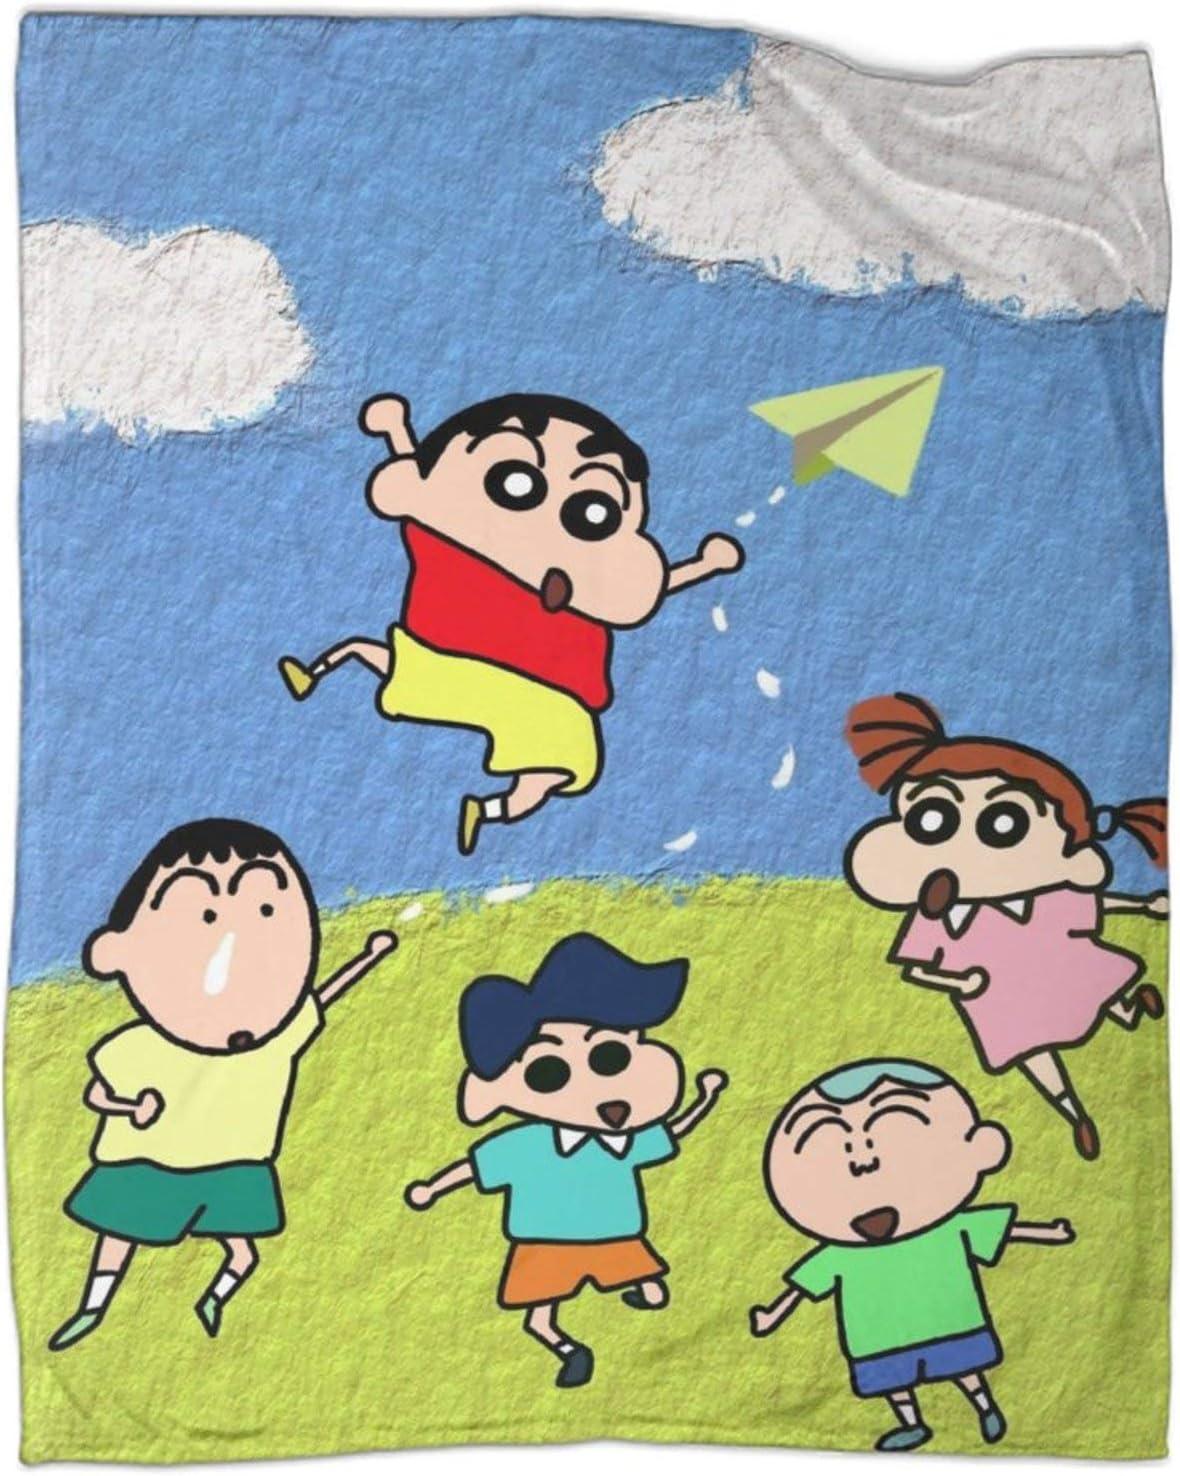 Crayon Shin-chan Shinchan Friends Cartoon Comics Plush Blankets for Home Use Blankets 30x40inch(80x100cm)